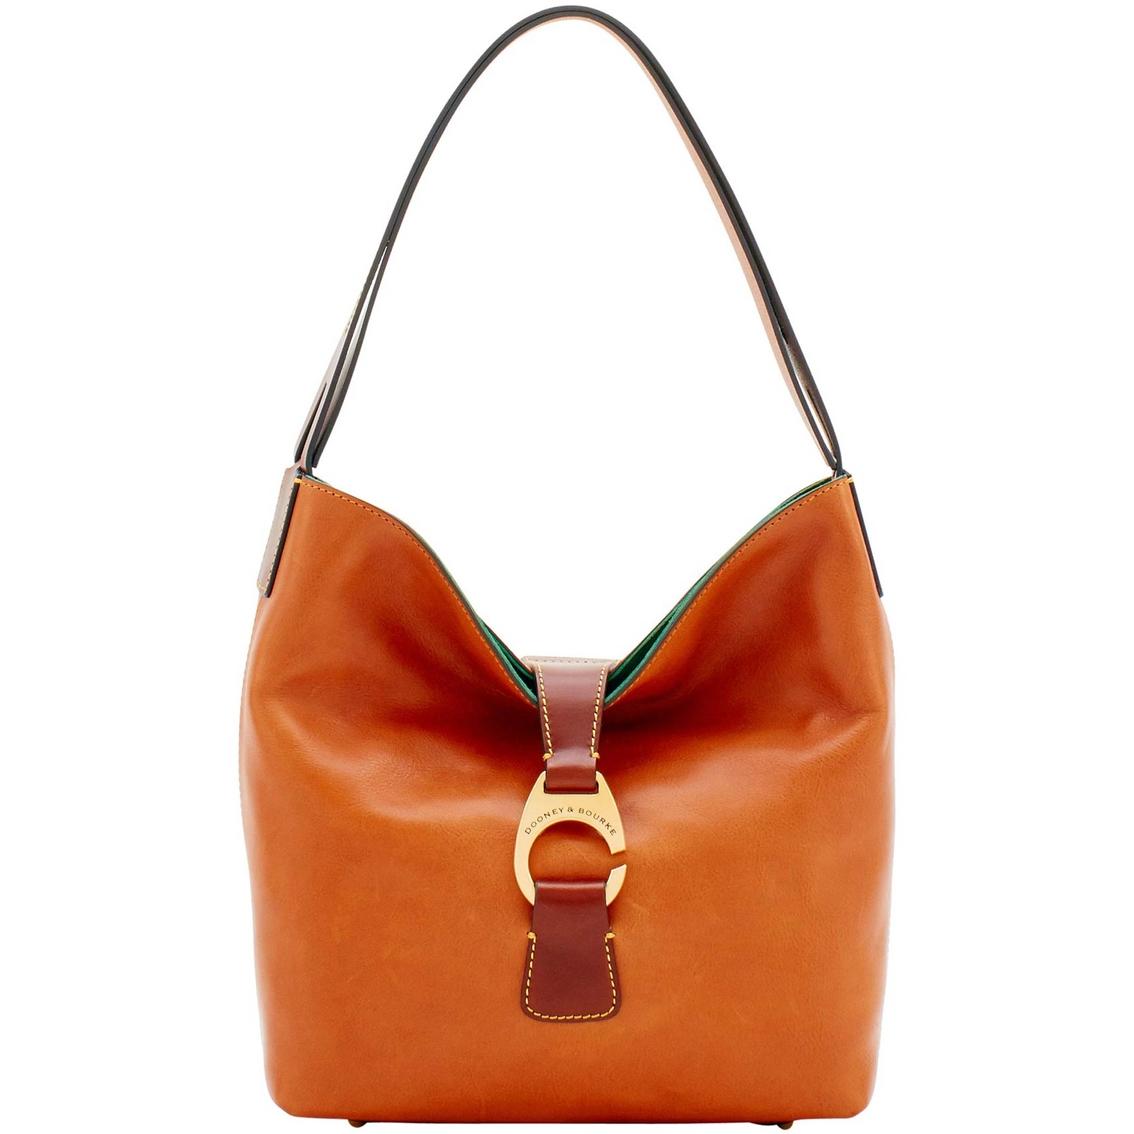 75b815341a78 Dooney & Bourke Derby Florentine Hobo   Hobo Bags   Handbags ...